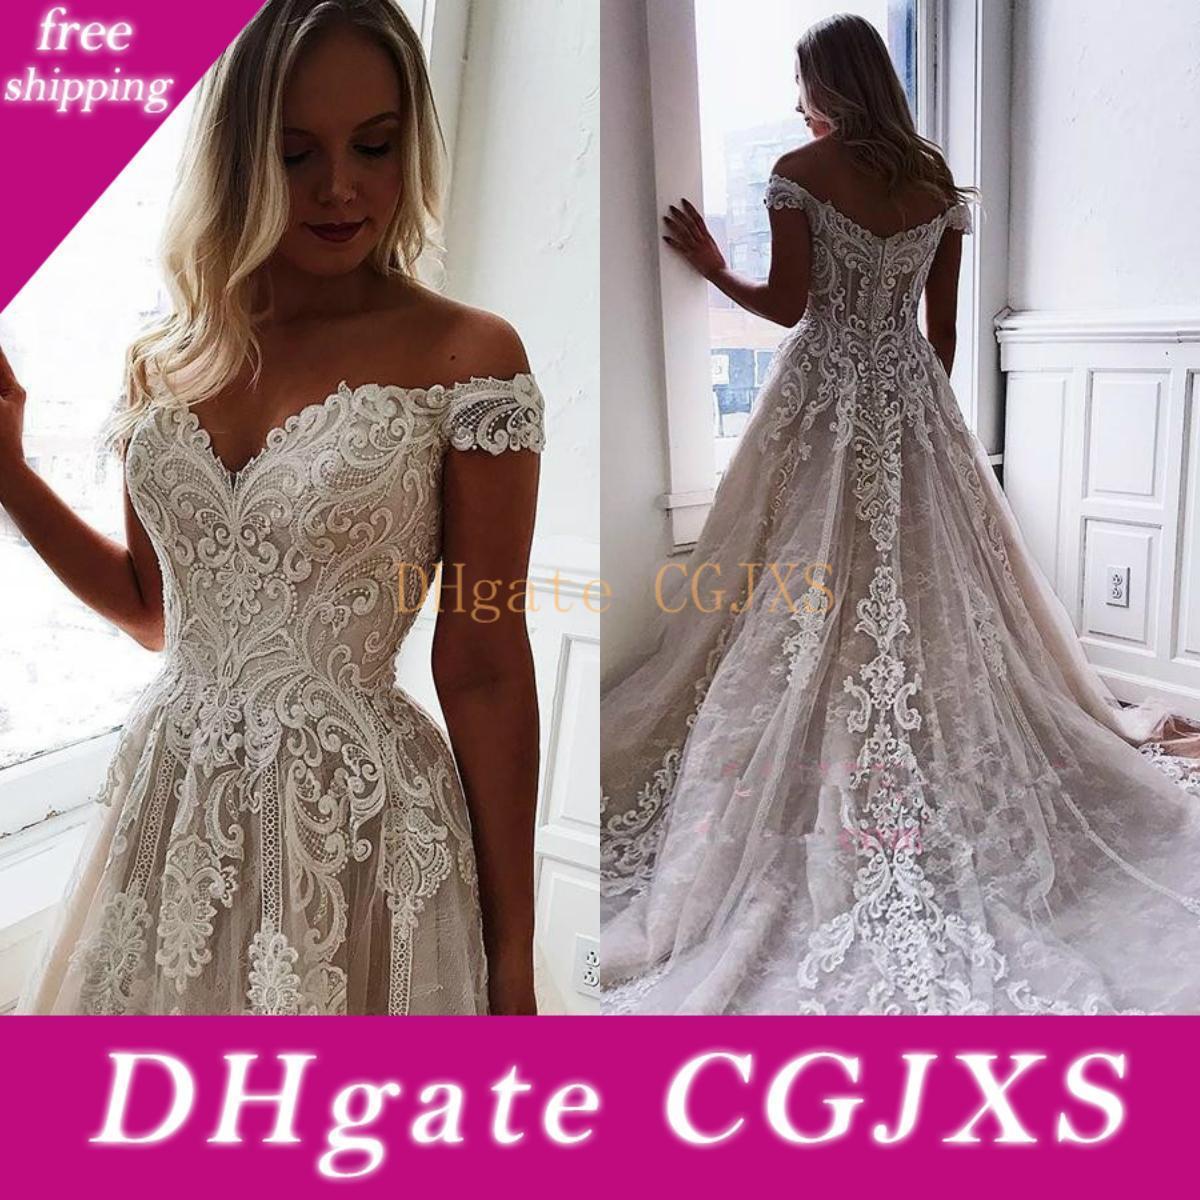 Elegant A Line Off Shoulder Wedding Dresses 2019 Lace Appliqued Bridal Gowns Sweep Train Tulle Beach Wedding Dress Western Robe De Soriee